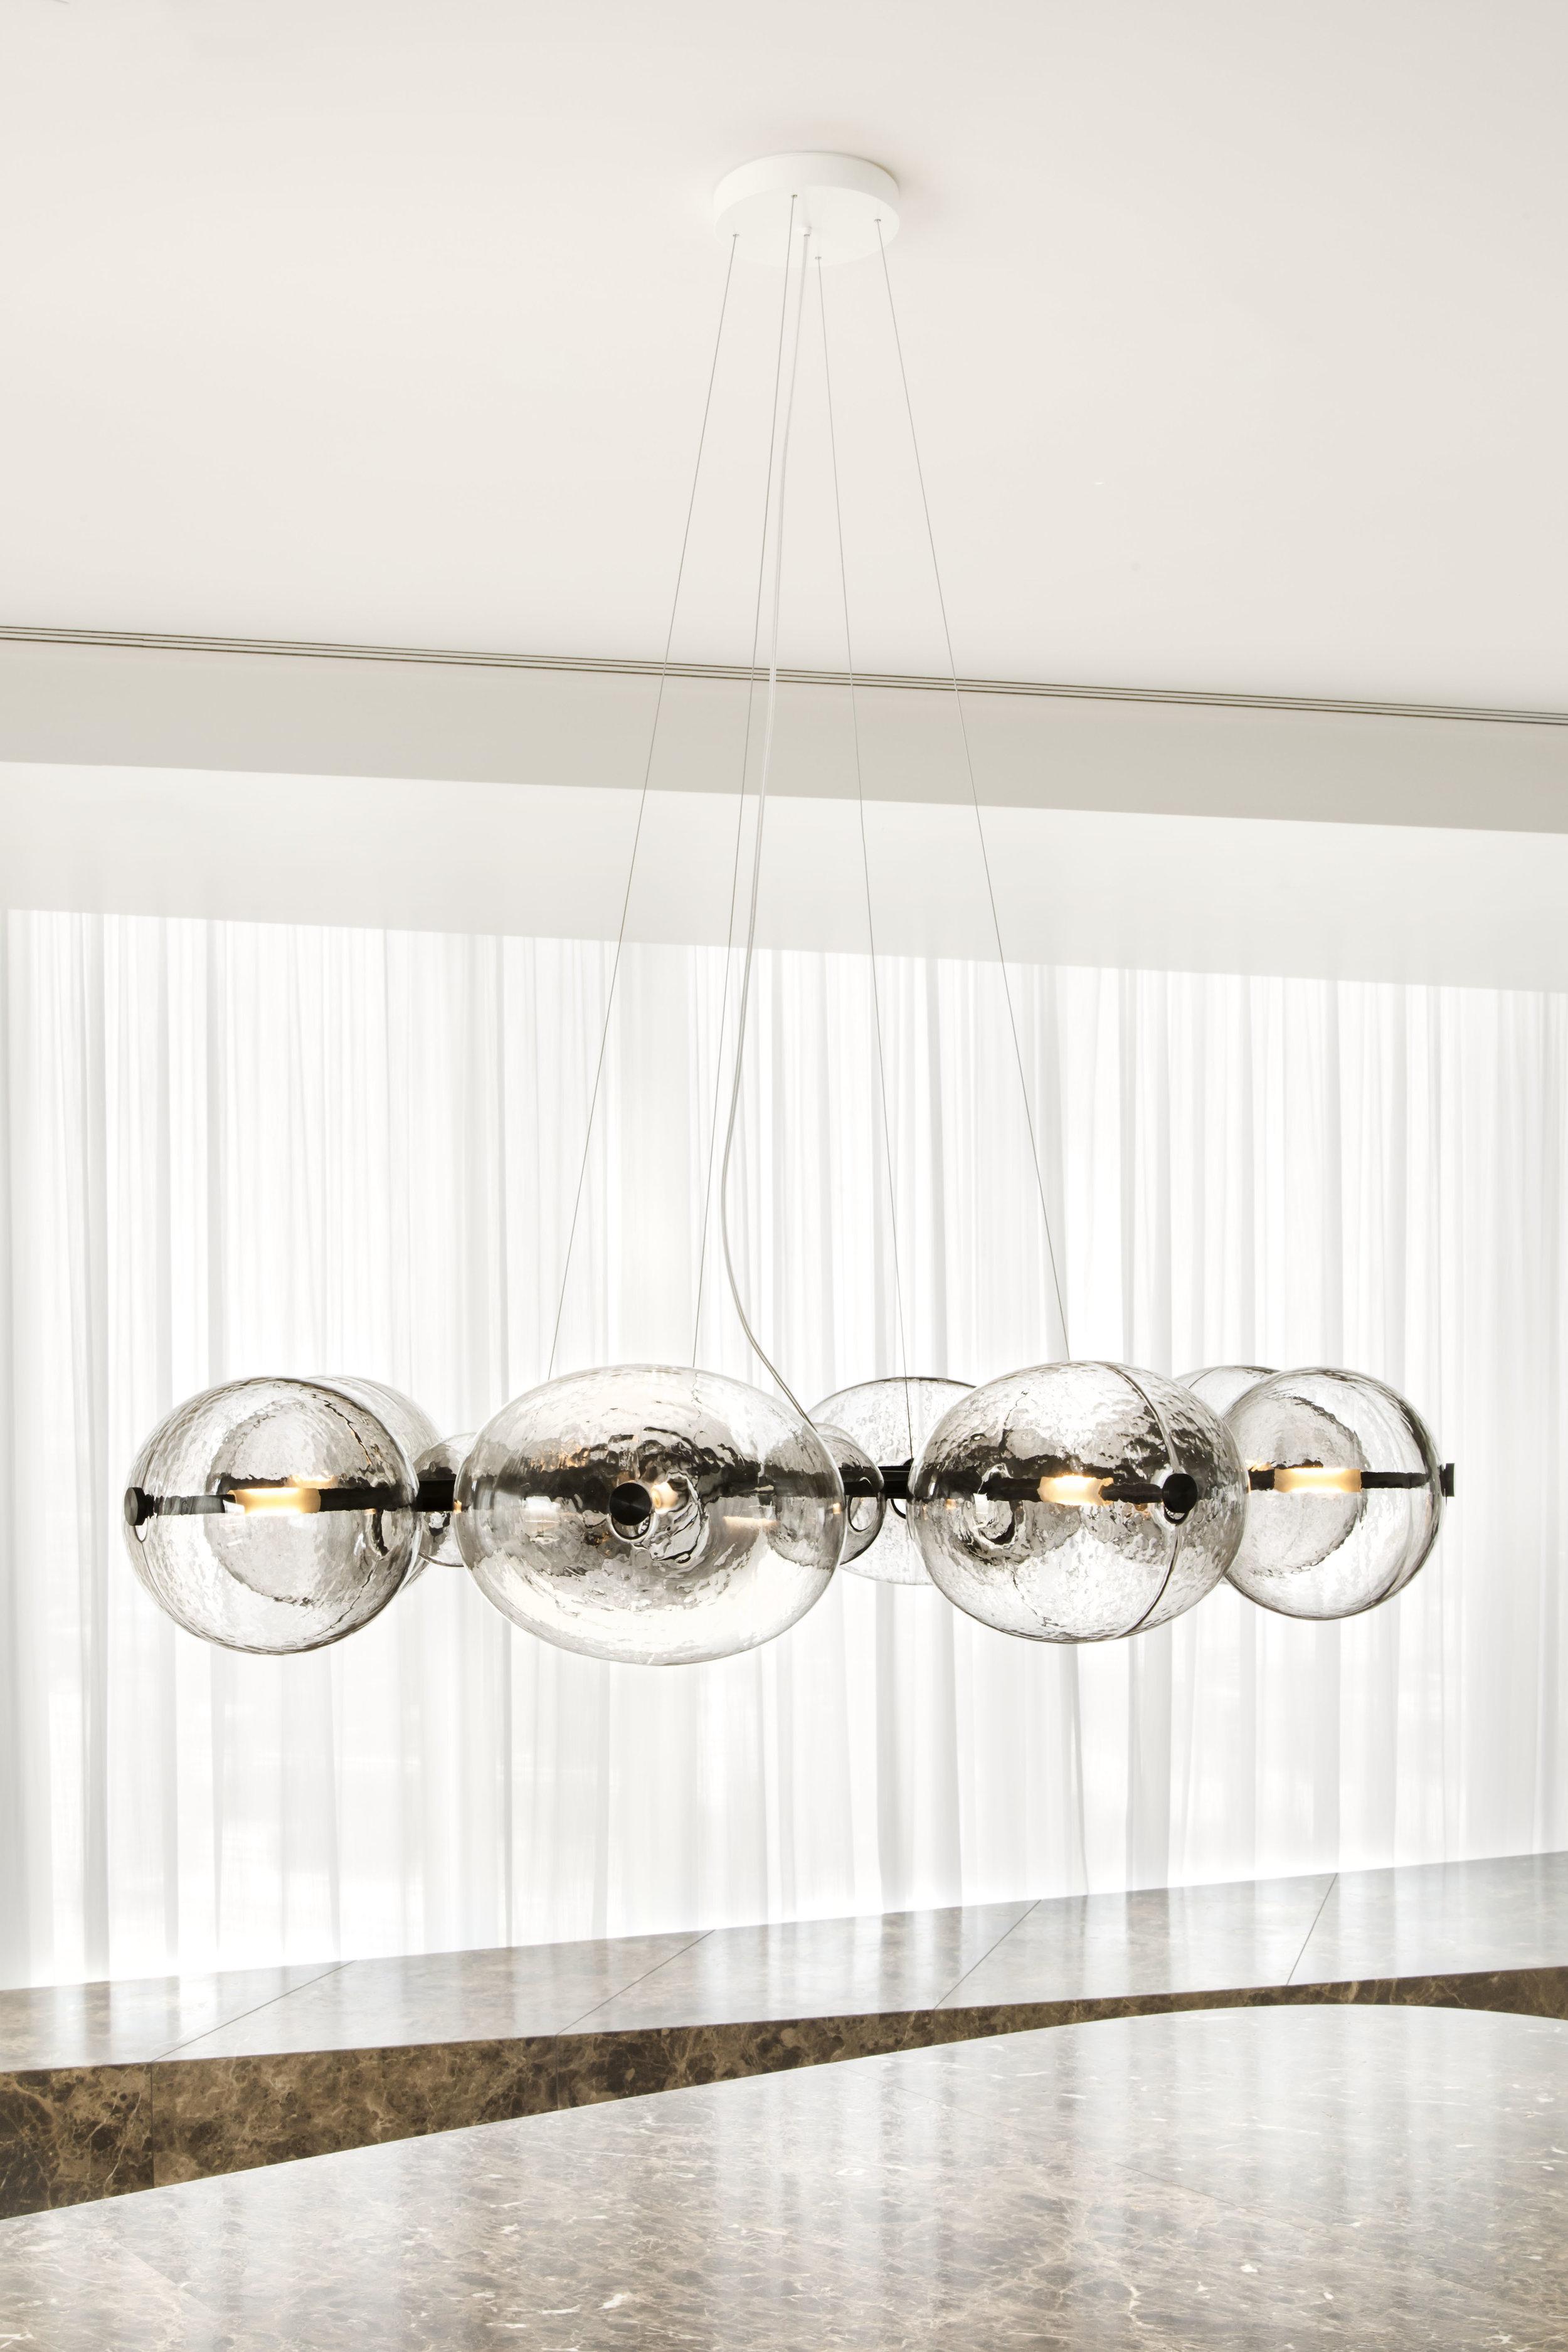 b-tomic-light_lighting-design_coordination-berlin_02.jpg